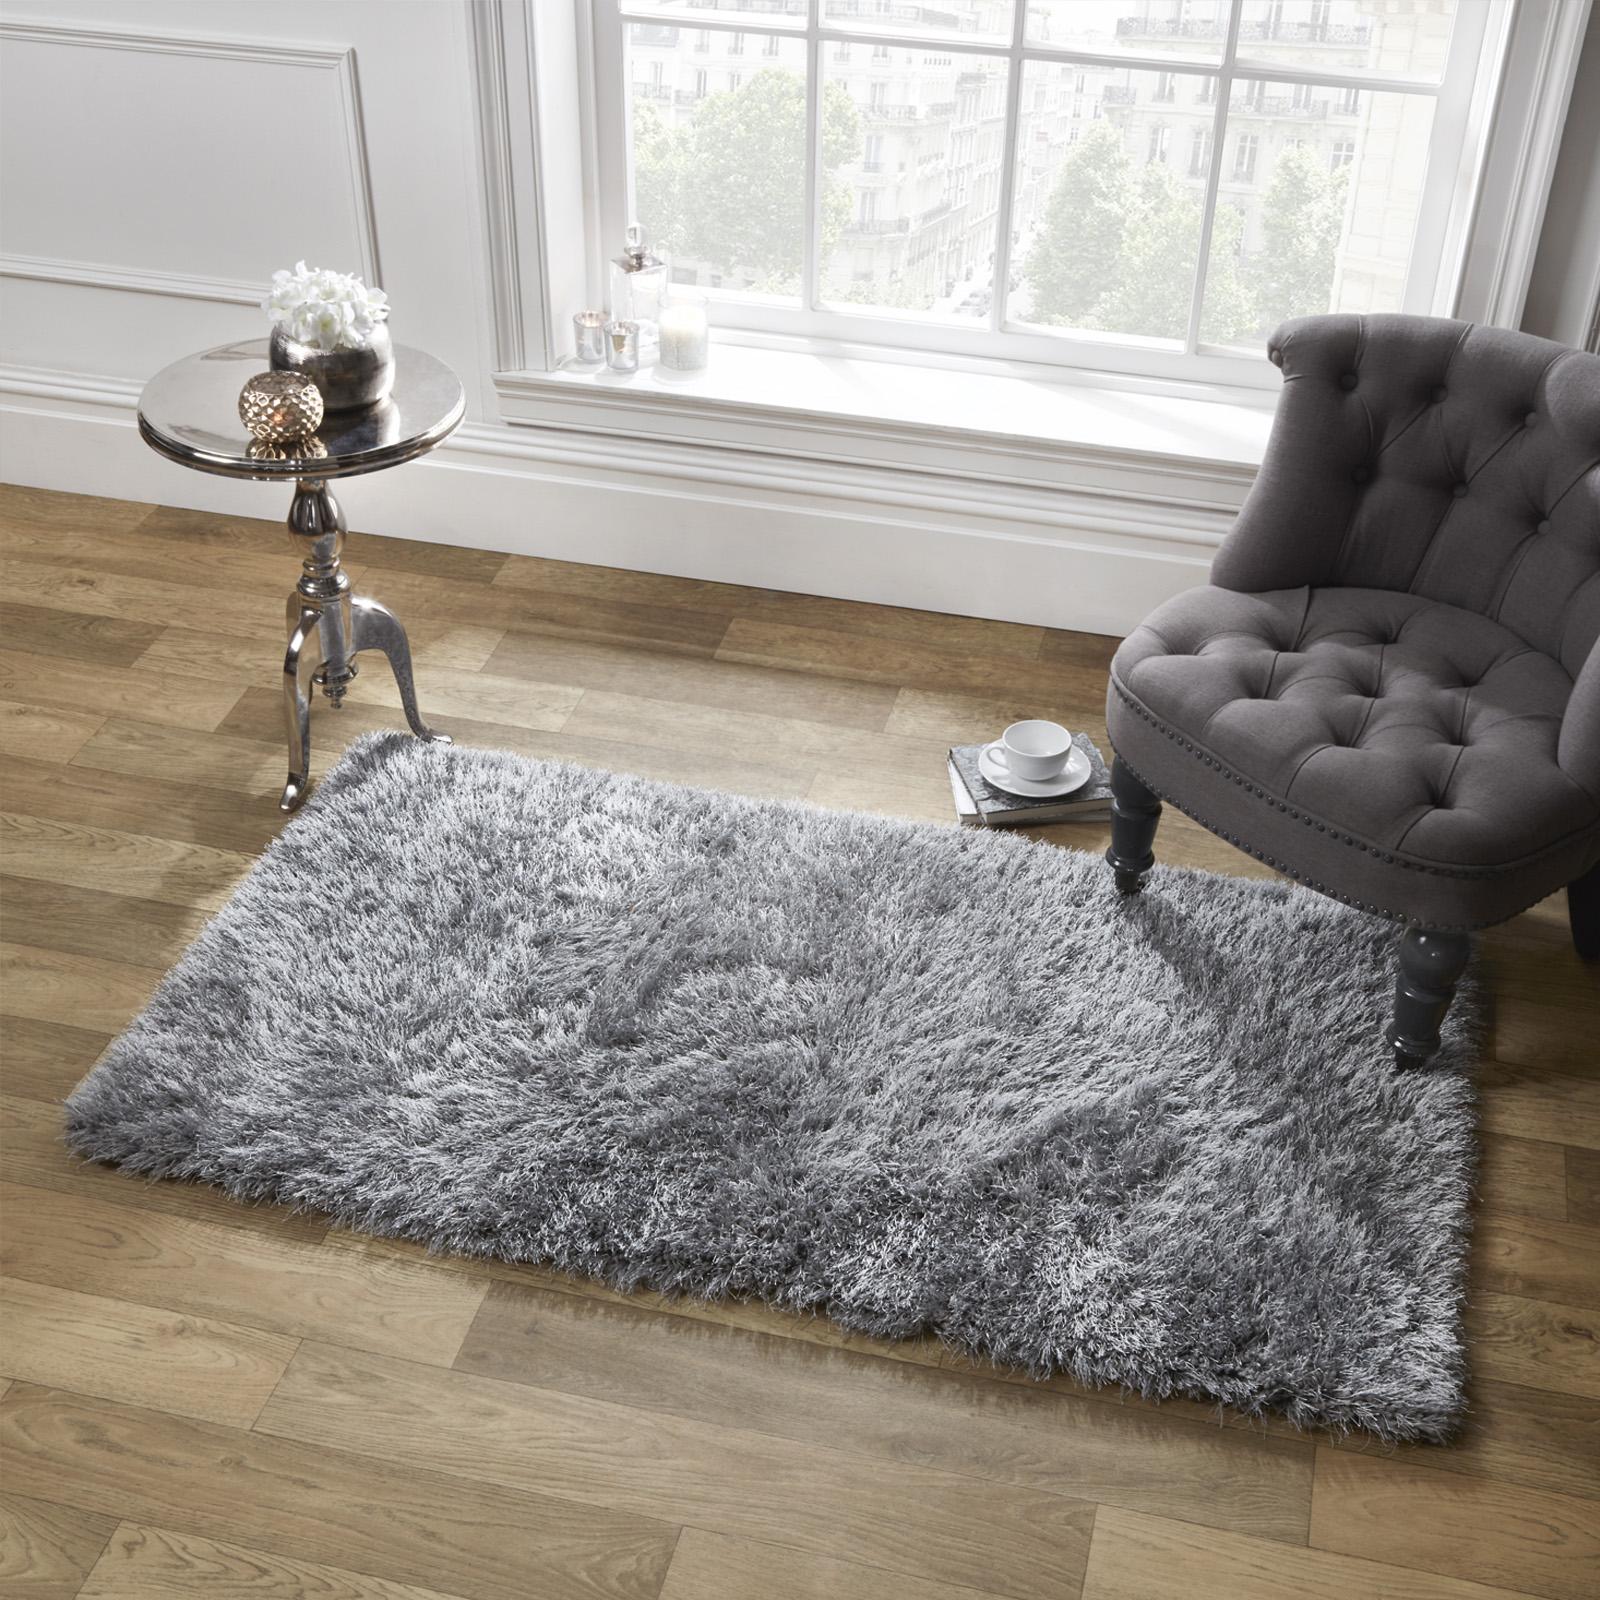 sienna gro shaggy bodenteppich uni weich funkeln bereich mat 5cm dicker flor ebay. Black Bedroom Furniture Sets. Home Design Ideas